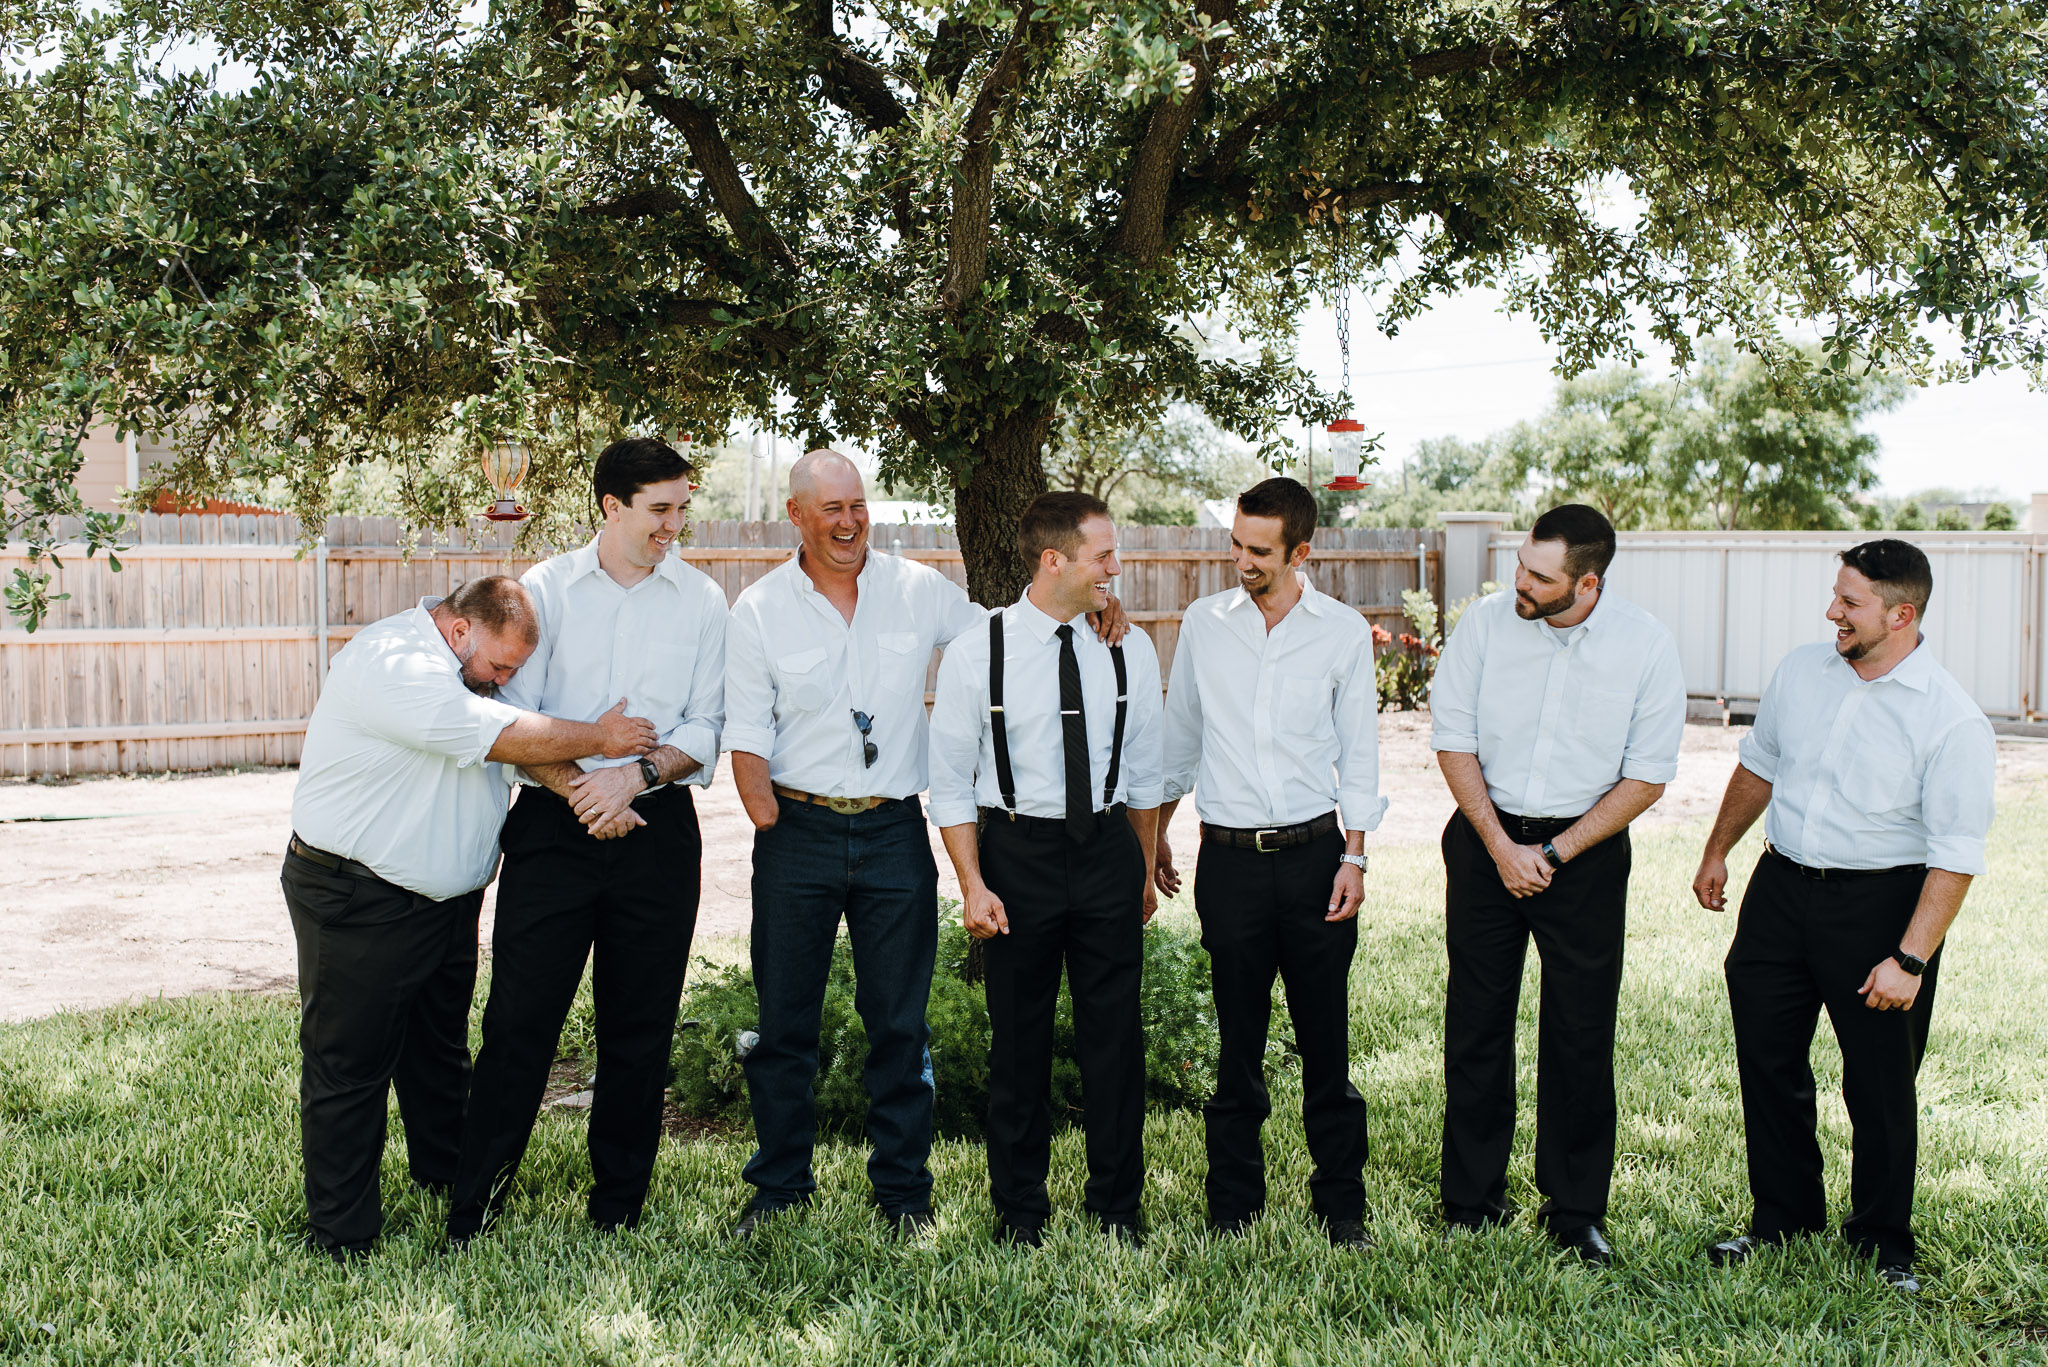 Rowena-West-Texas-Wedding-Photographer-Gillian&Ryan-0006.jpg